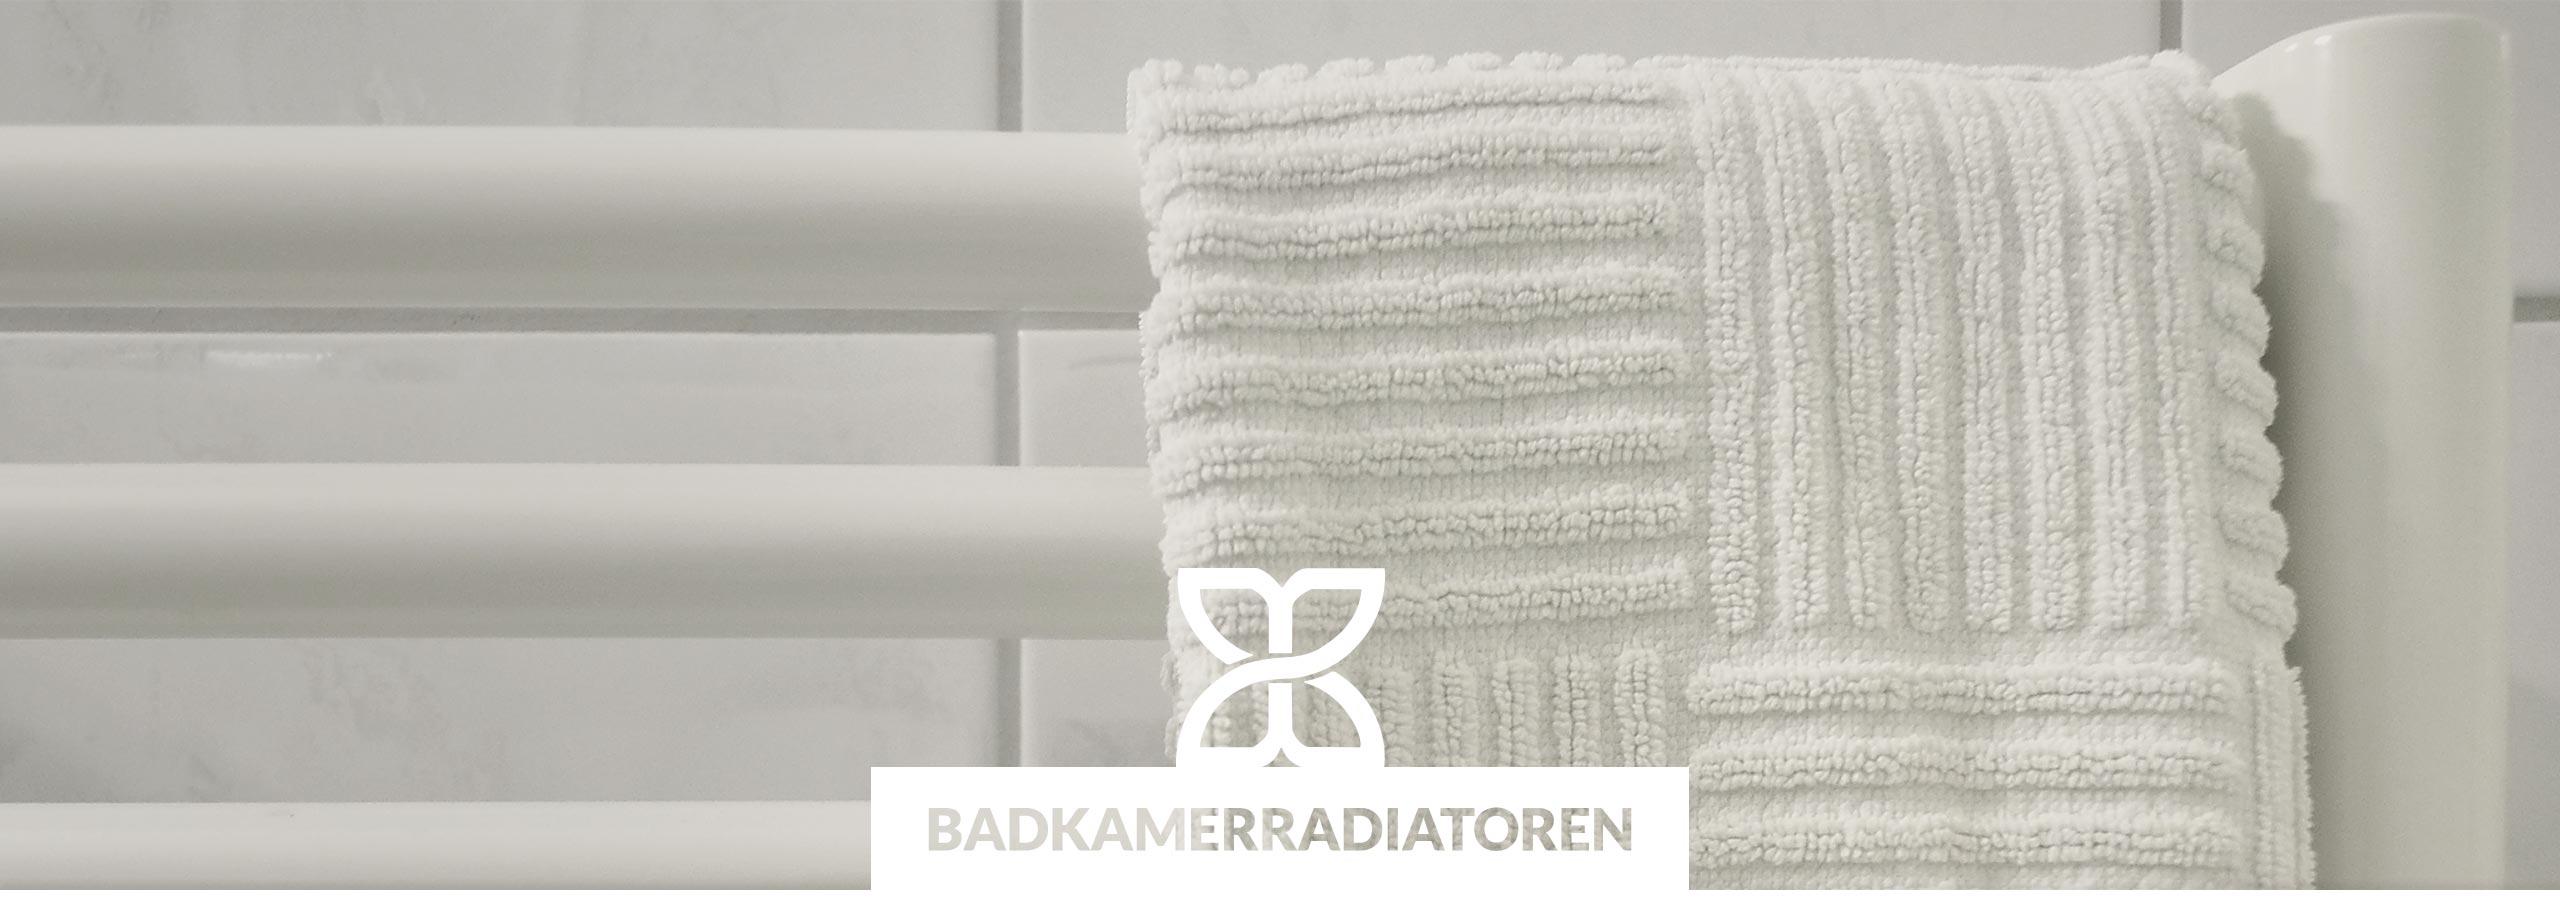 https://www.boerboomloodgieter.nl/files/thumbnails/boerboom-loodgietersbedrijf-h-badkamerradiatoren.2560x900.jpg